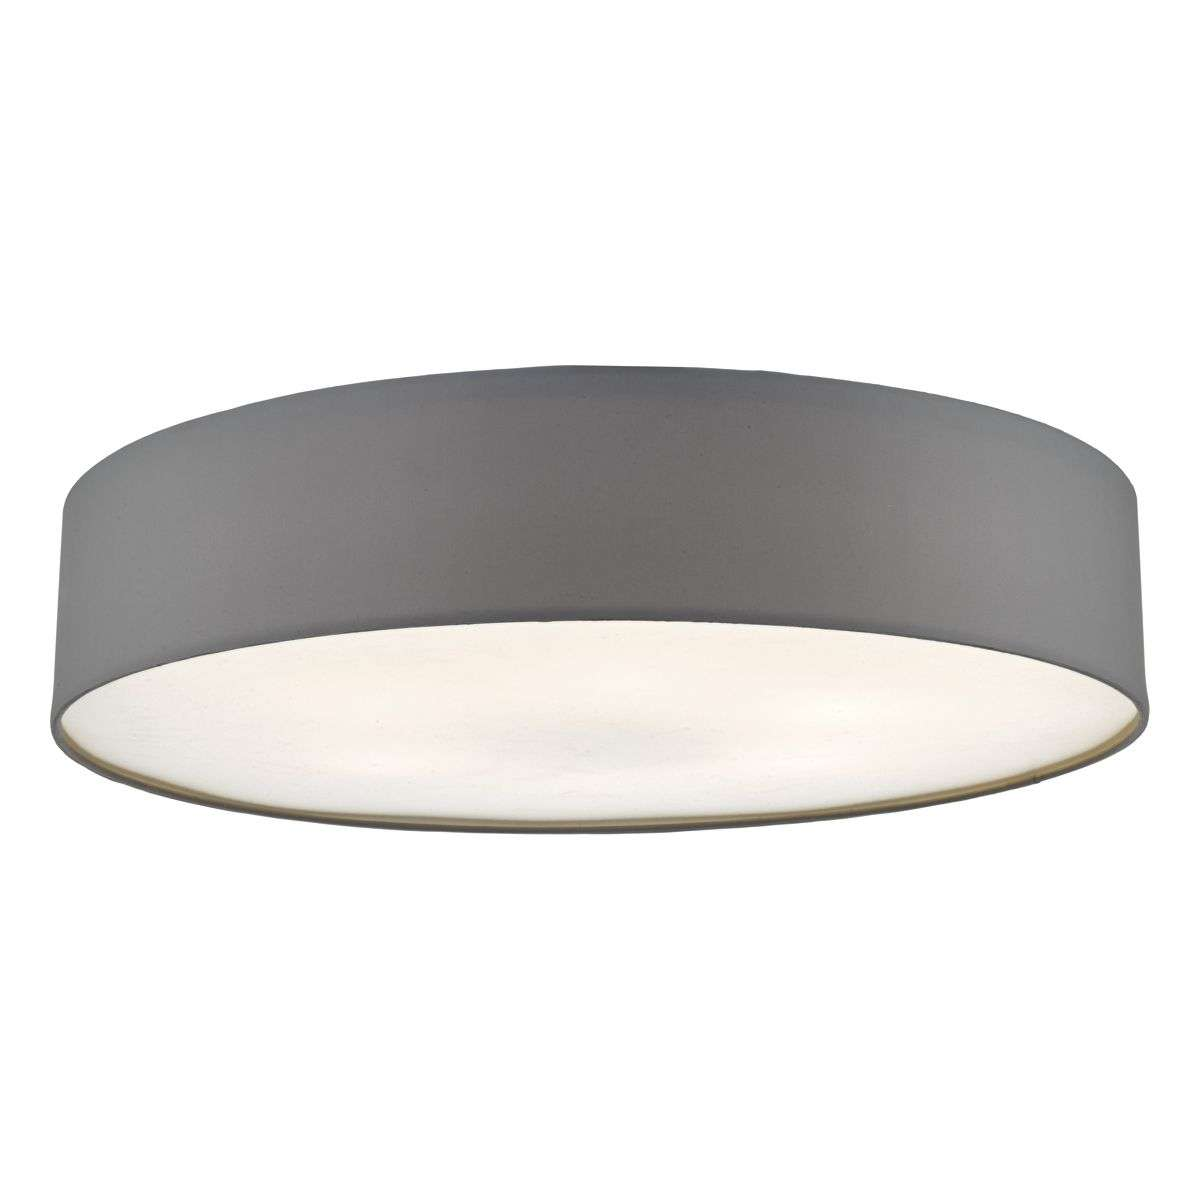 Cierro 6 Light Flush Fitting in Grey